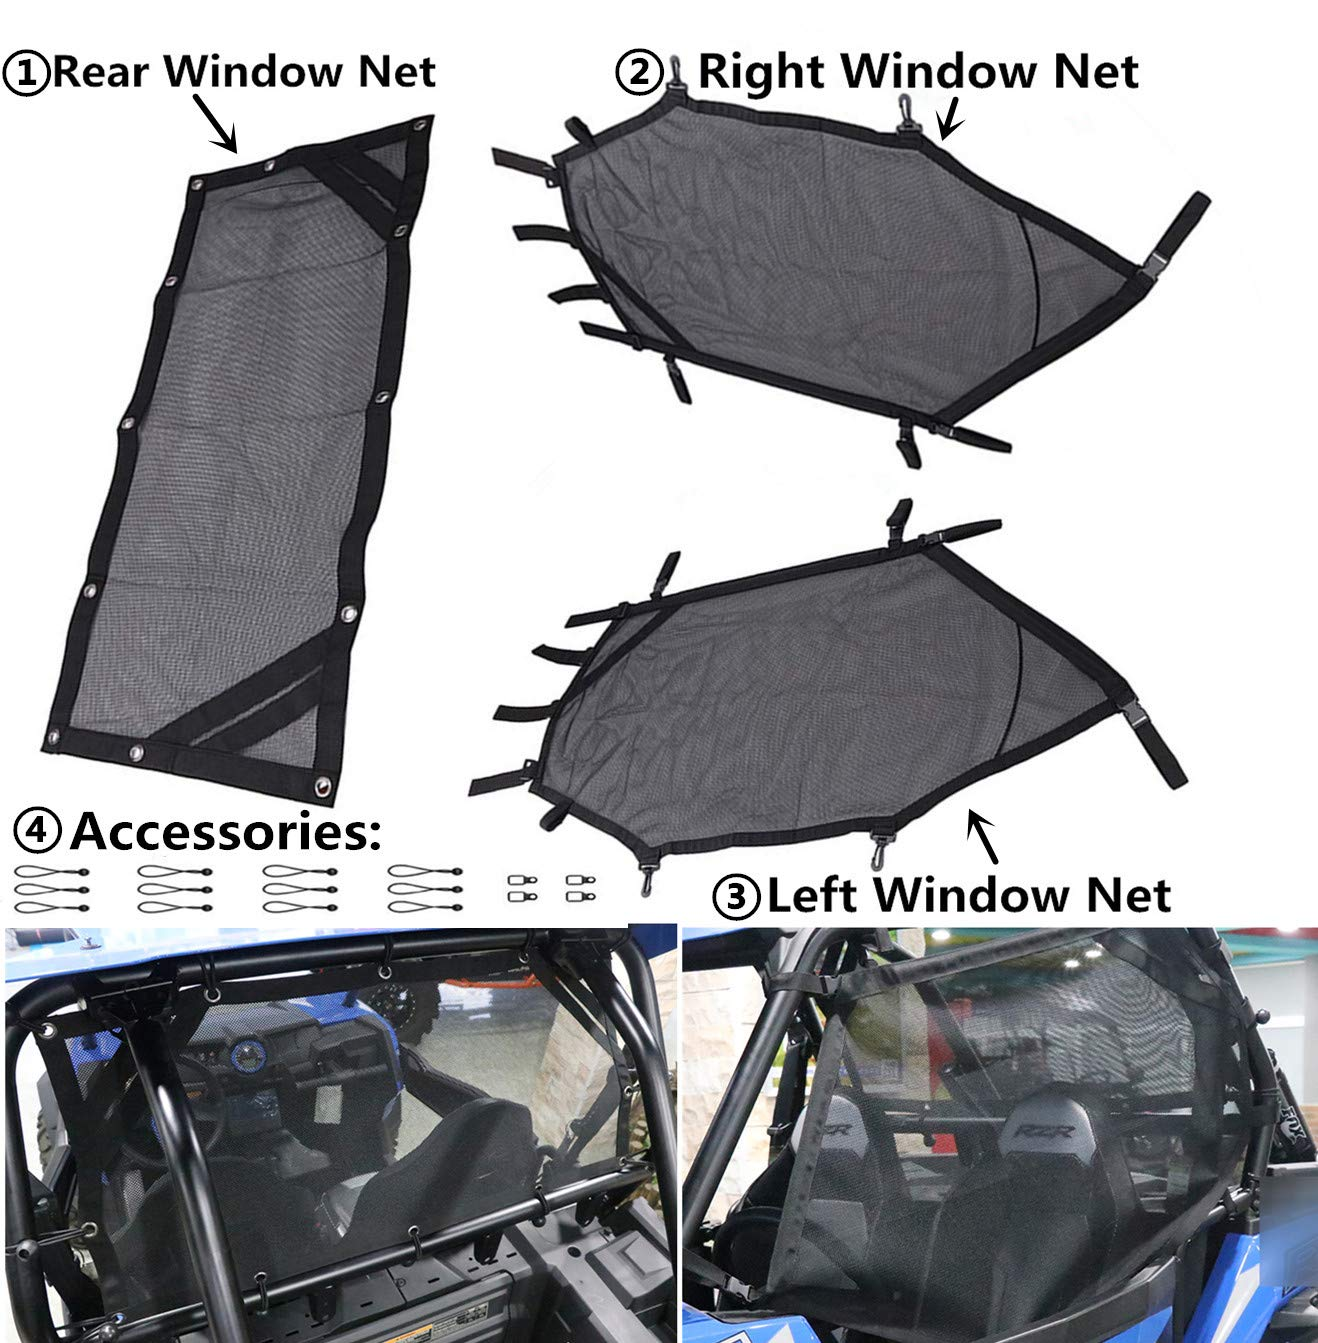 MFC Front Rear Window Net Window Shade Shield Cover for Polaris RZR 1000 900 RZR XP 4 UTV 2015-2018